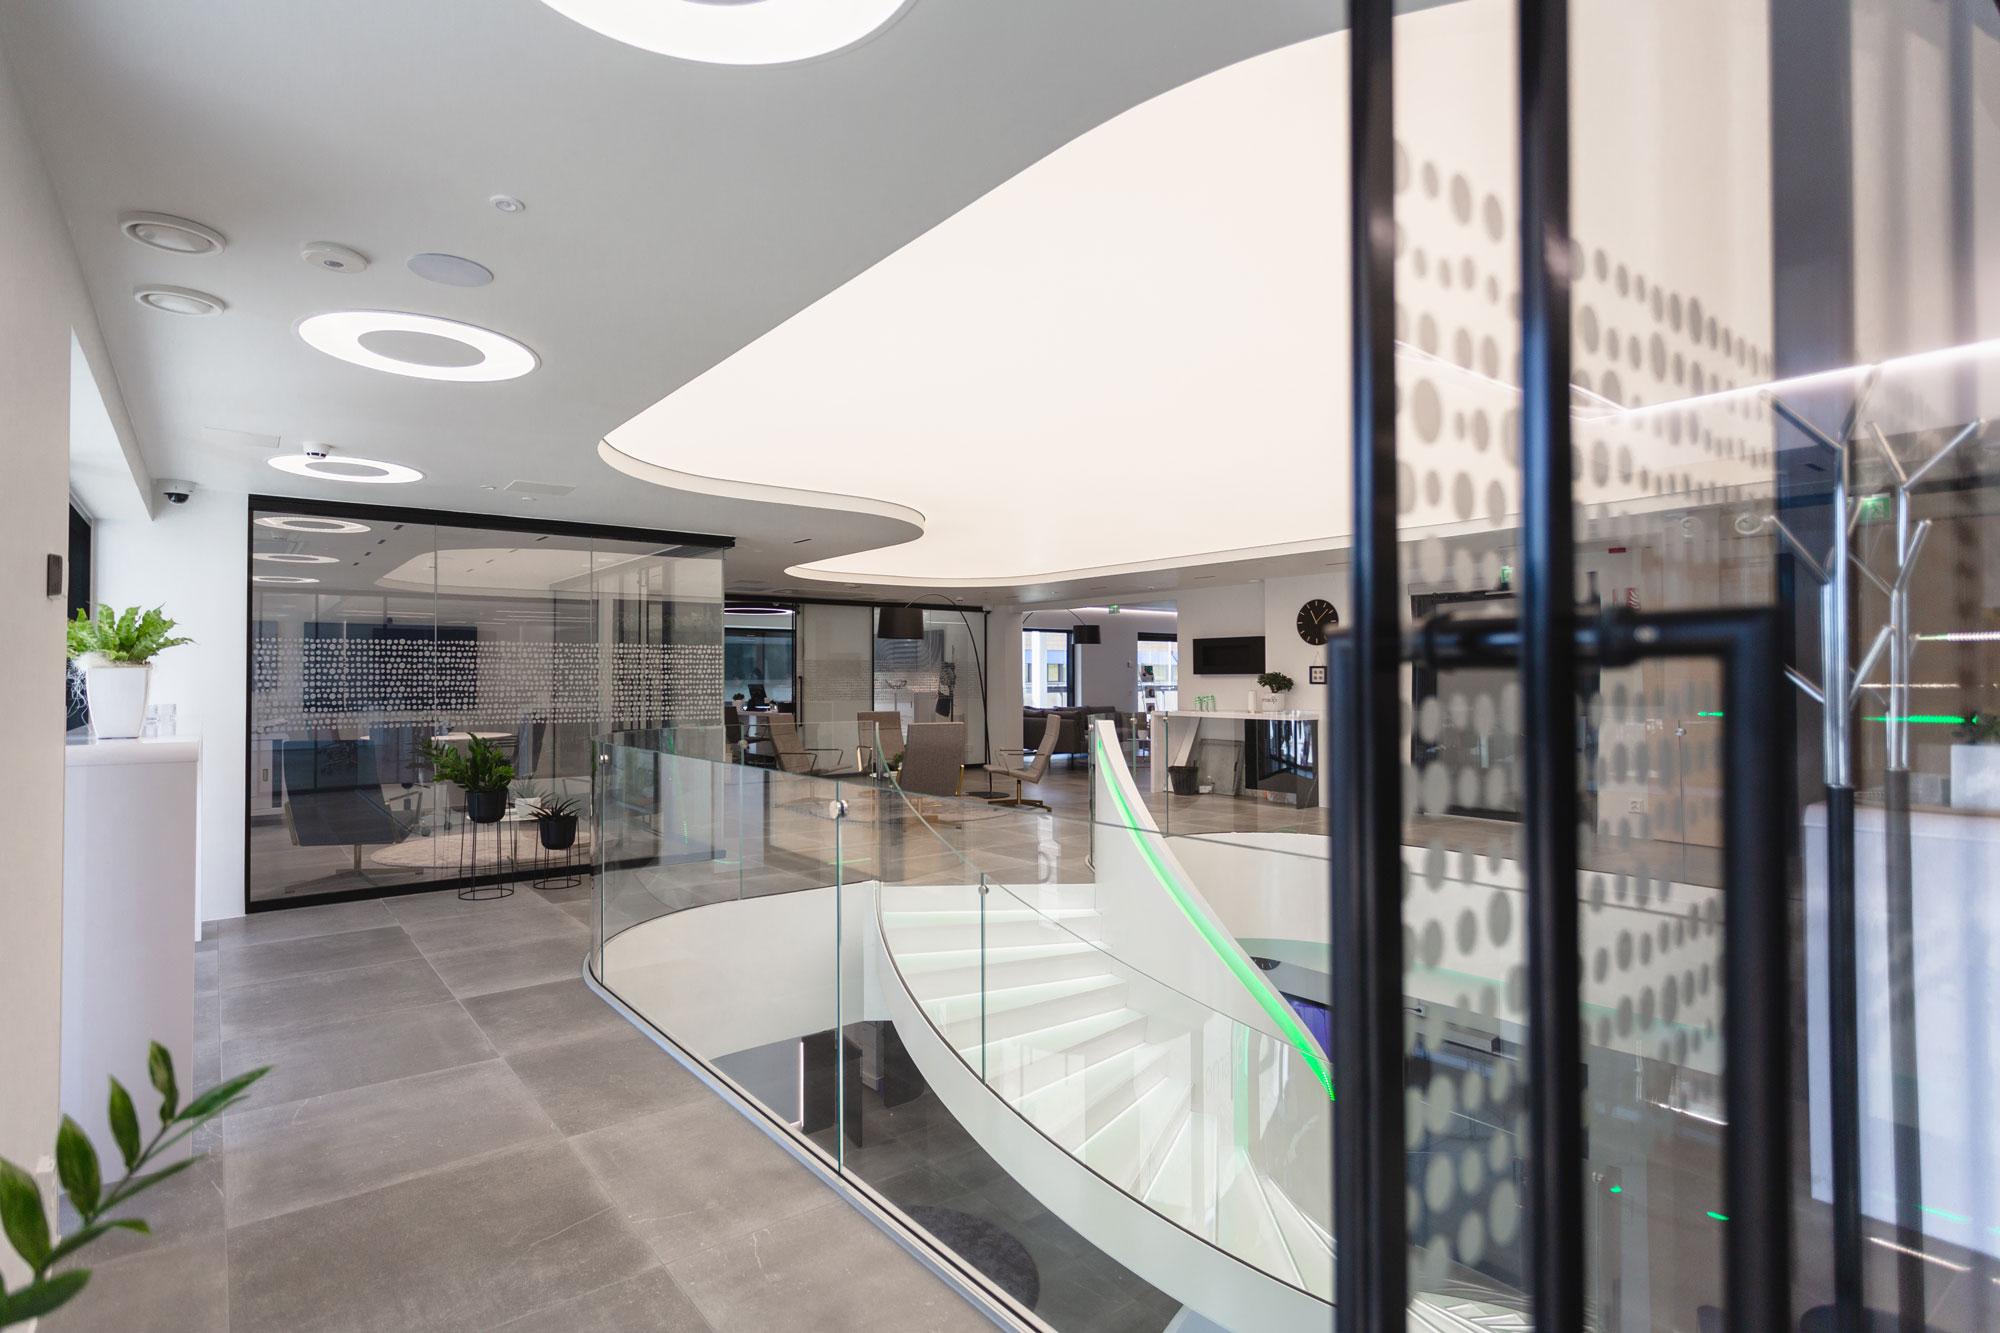 Scanmikael Office glass walls_Glass balustrades_Smart glass walls_OmaSp, Seinäjoki, Finland